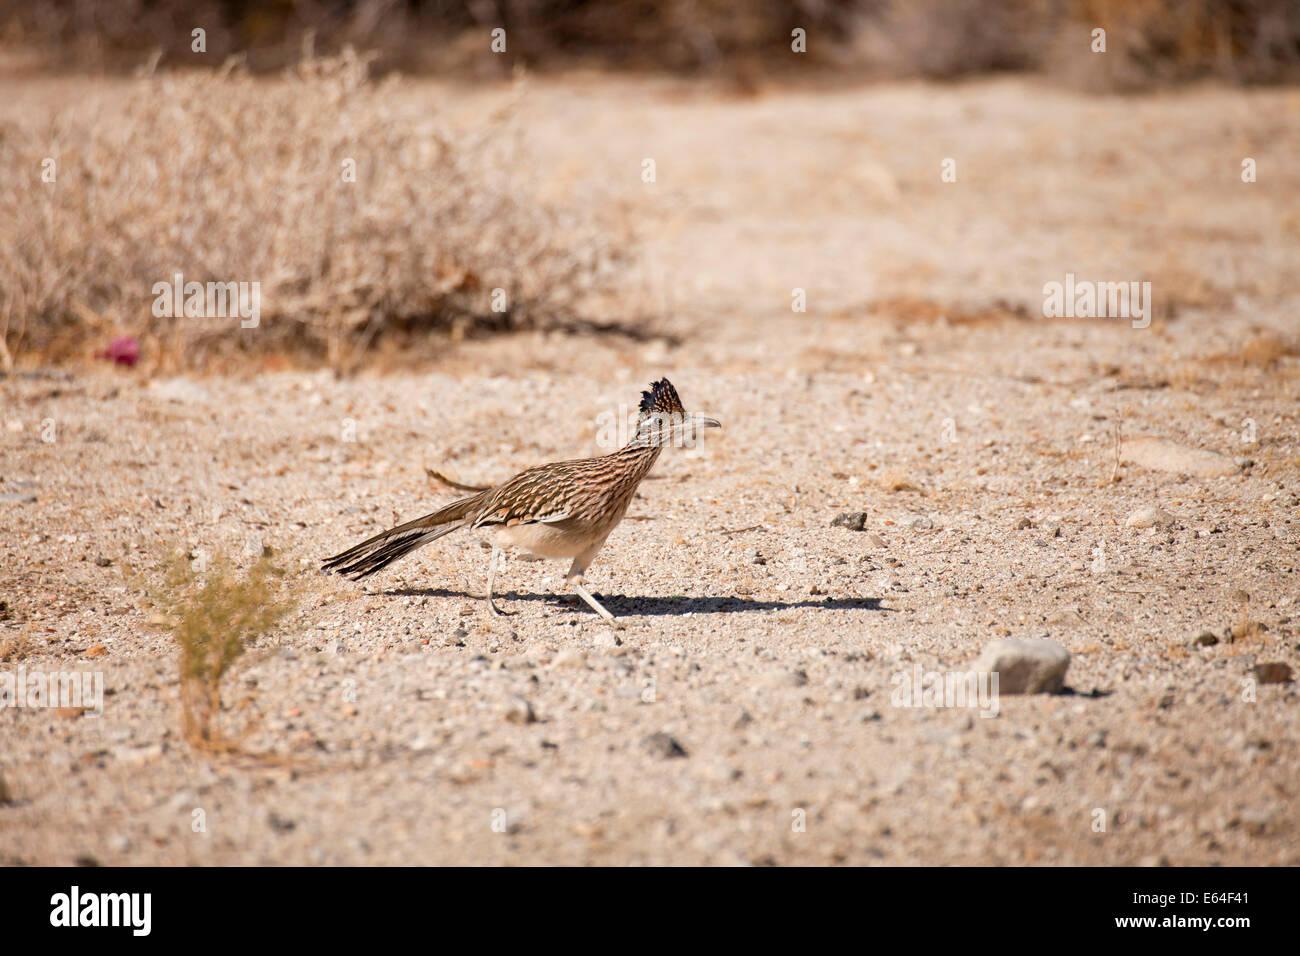 Roadrunner (Geococcyx californianus) in the desert near Palm Springs, California, United States of America, USA - Stock Image